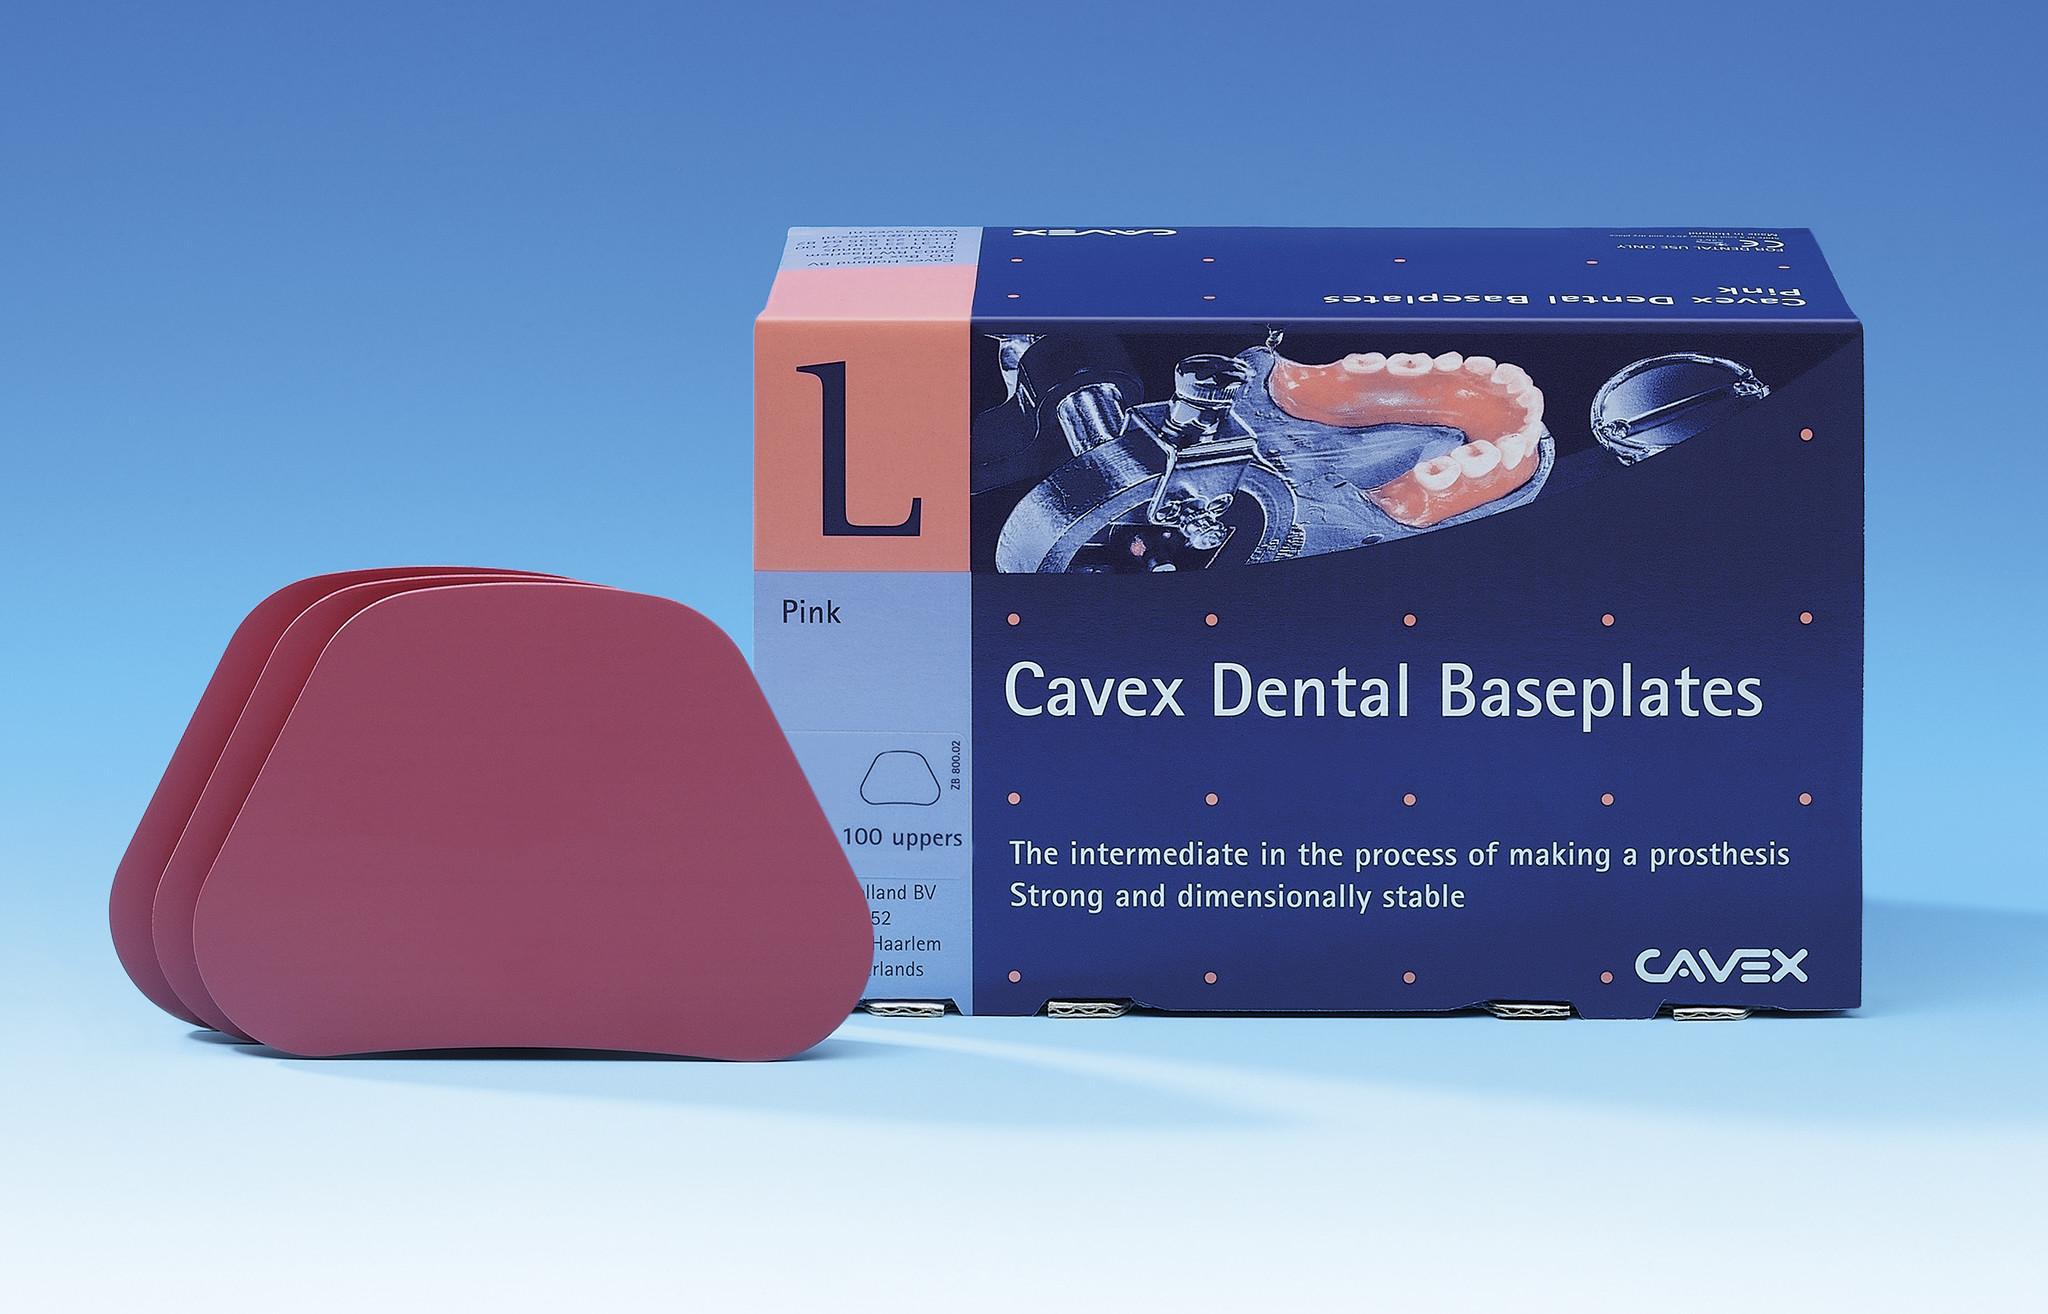 Cavex Baseplates onder